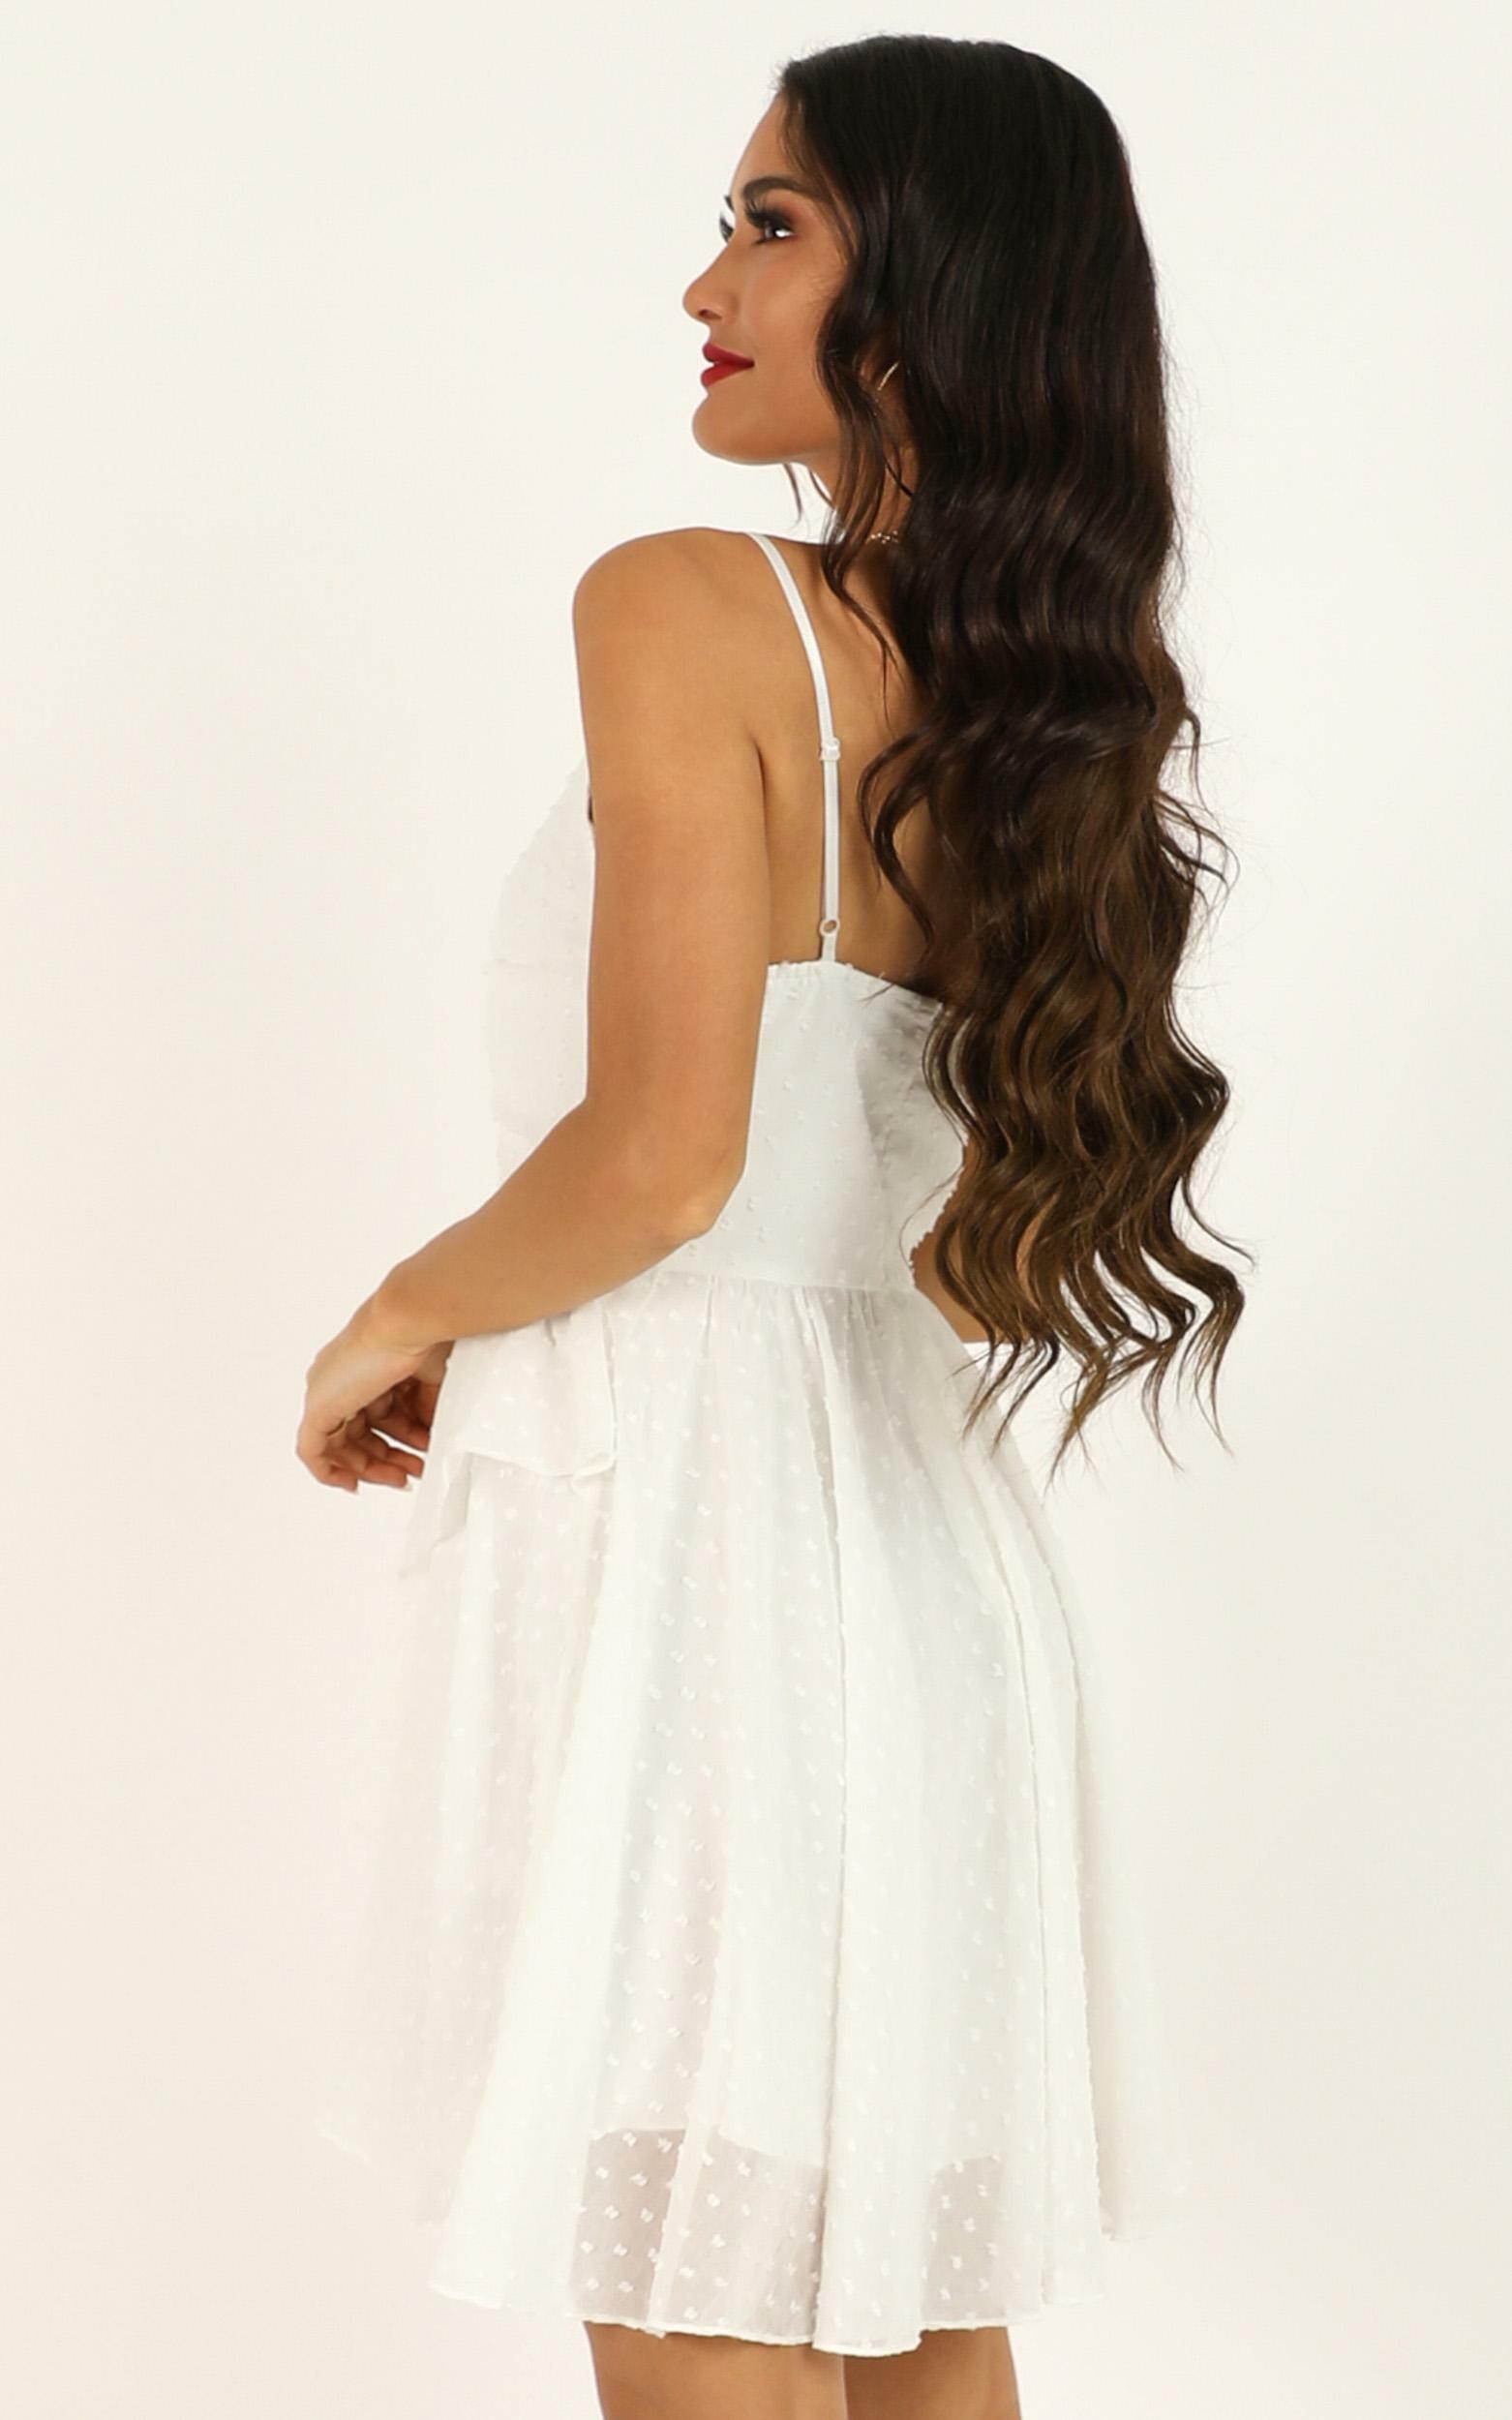 Feels Like heaven dress in white - 20 (XXXXL), White, hi-res image number null